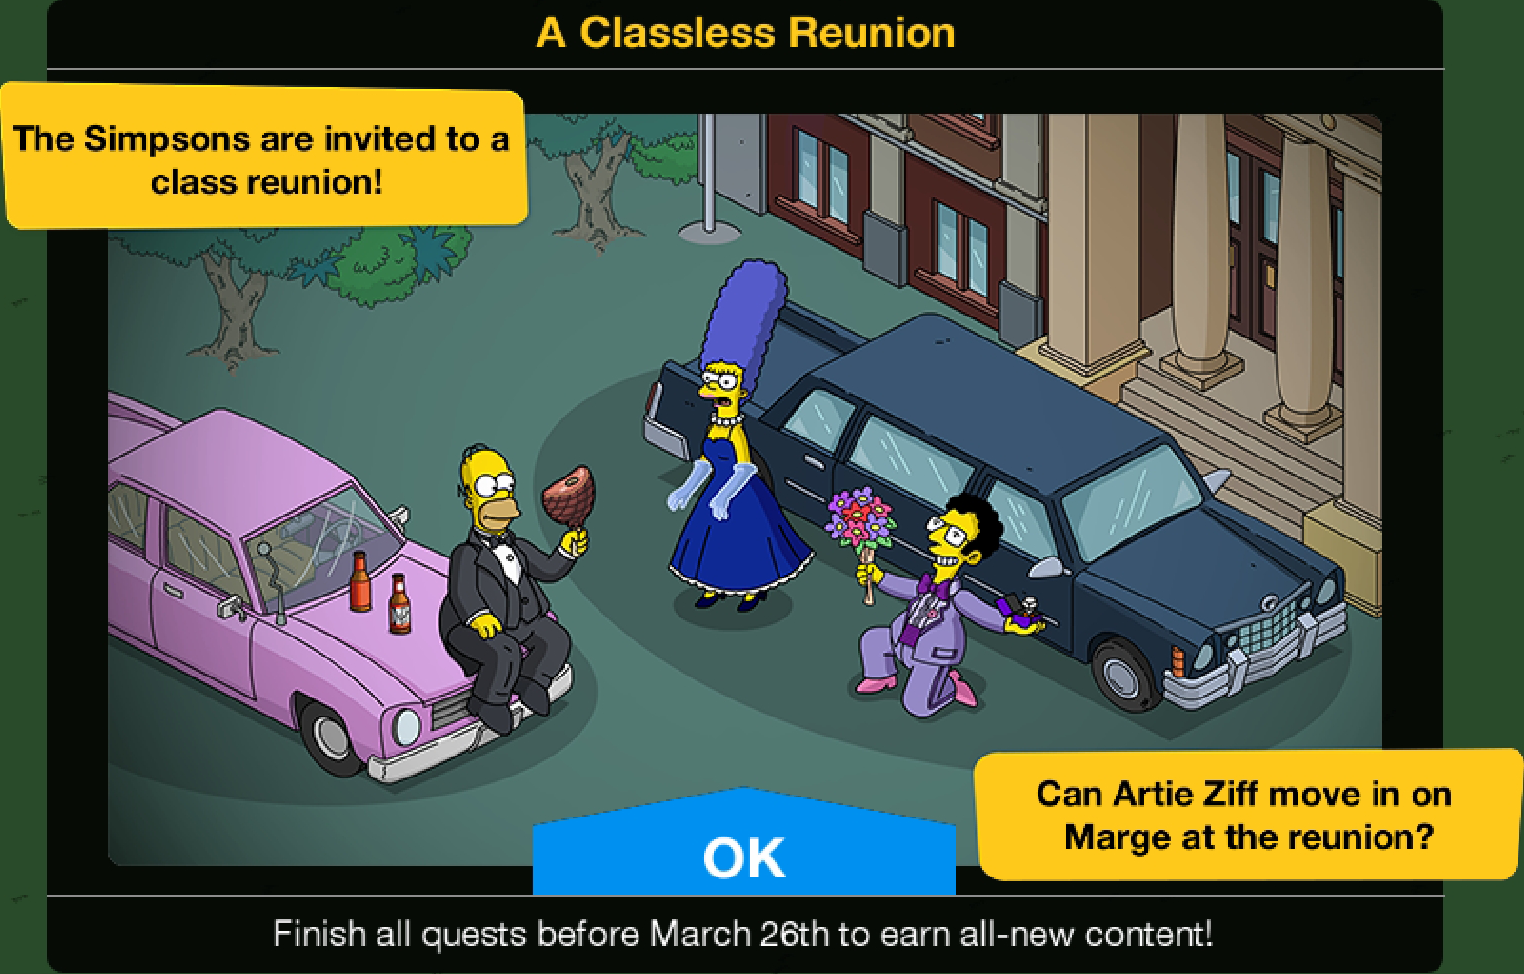 A_Classless_Reunion_Guide.png